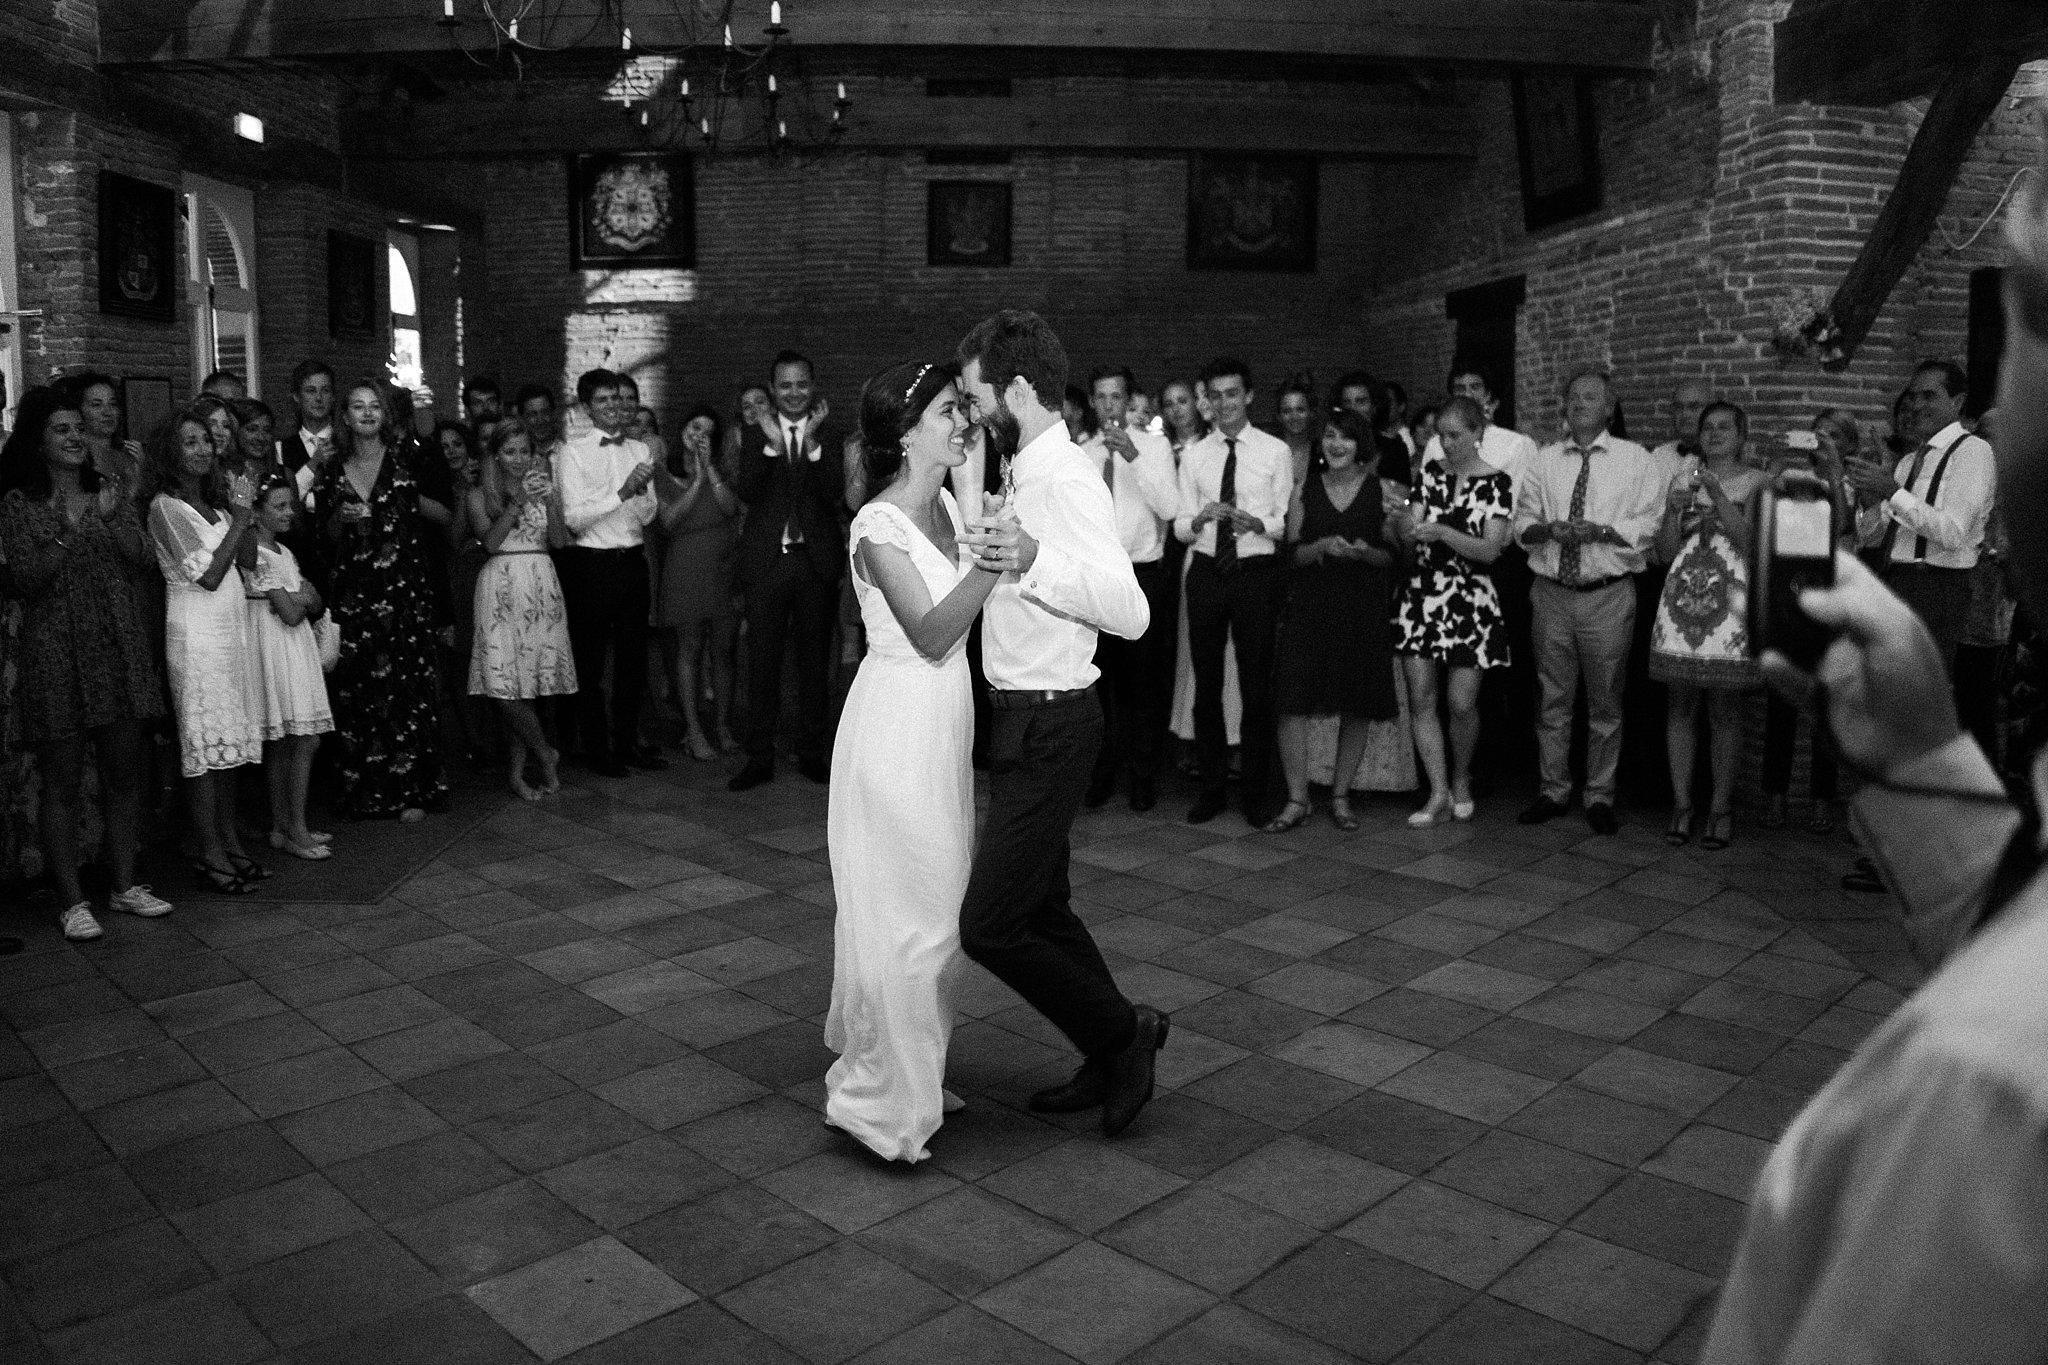 Mariage-a-la-maison-secall-hugo-hennequin-photographe-mariage-perpignan_0106.jpg